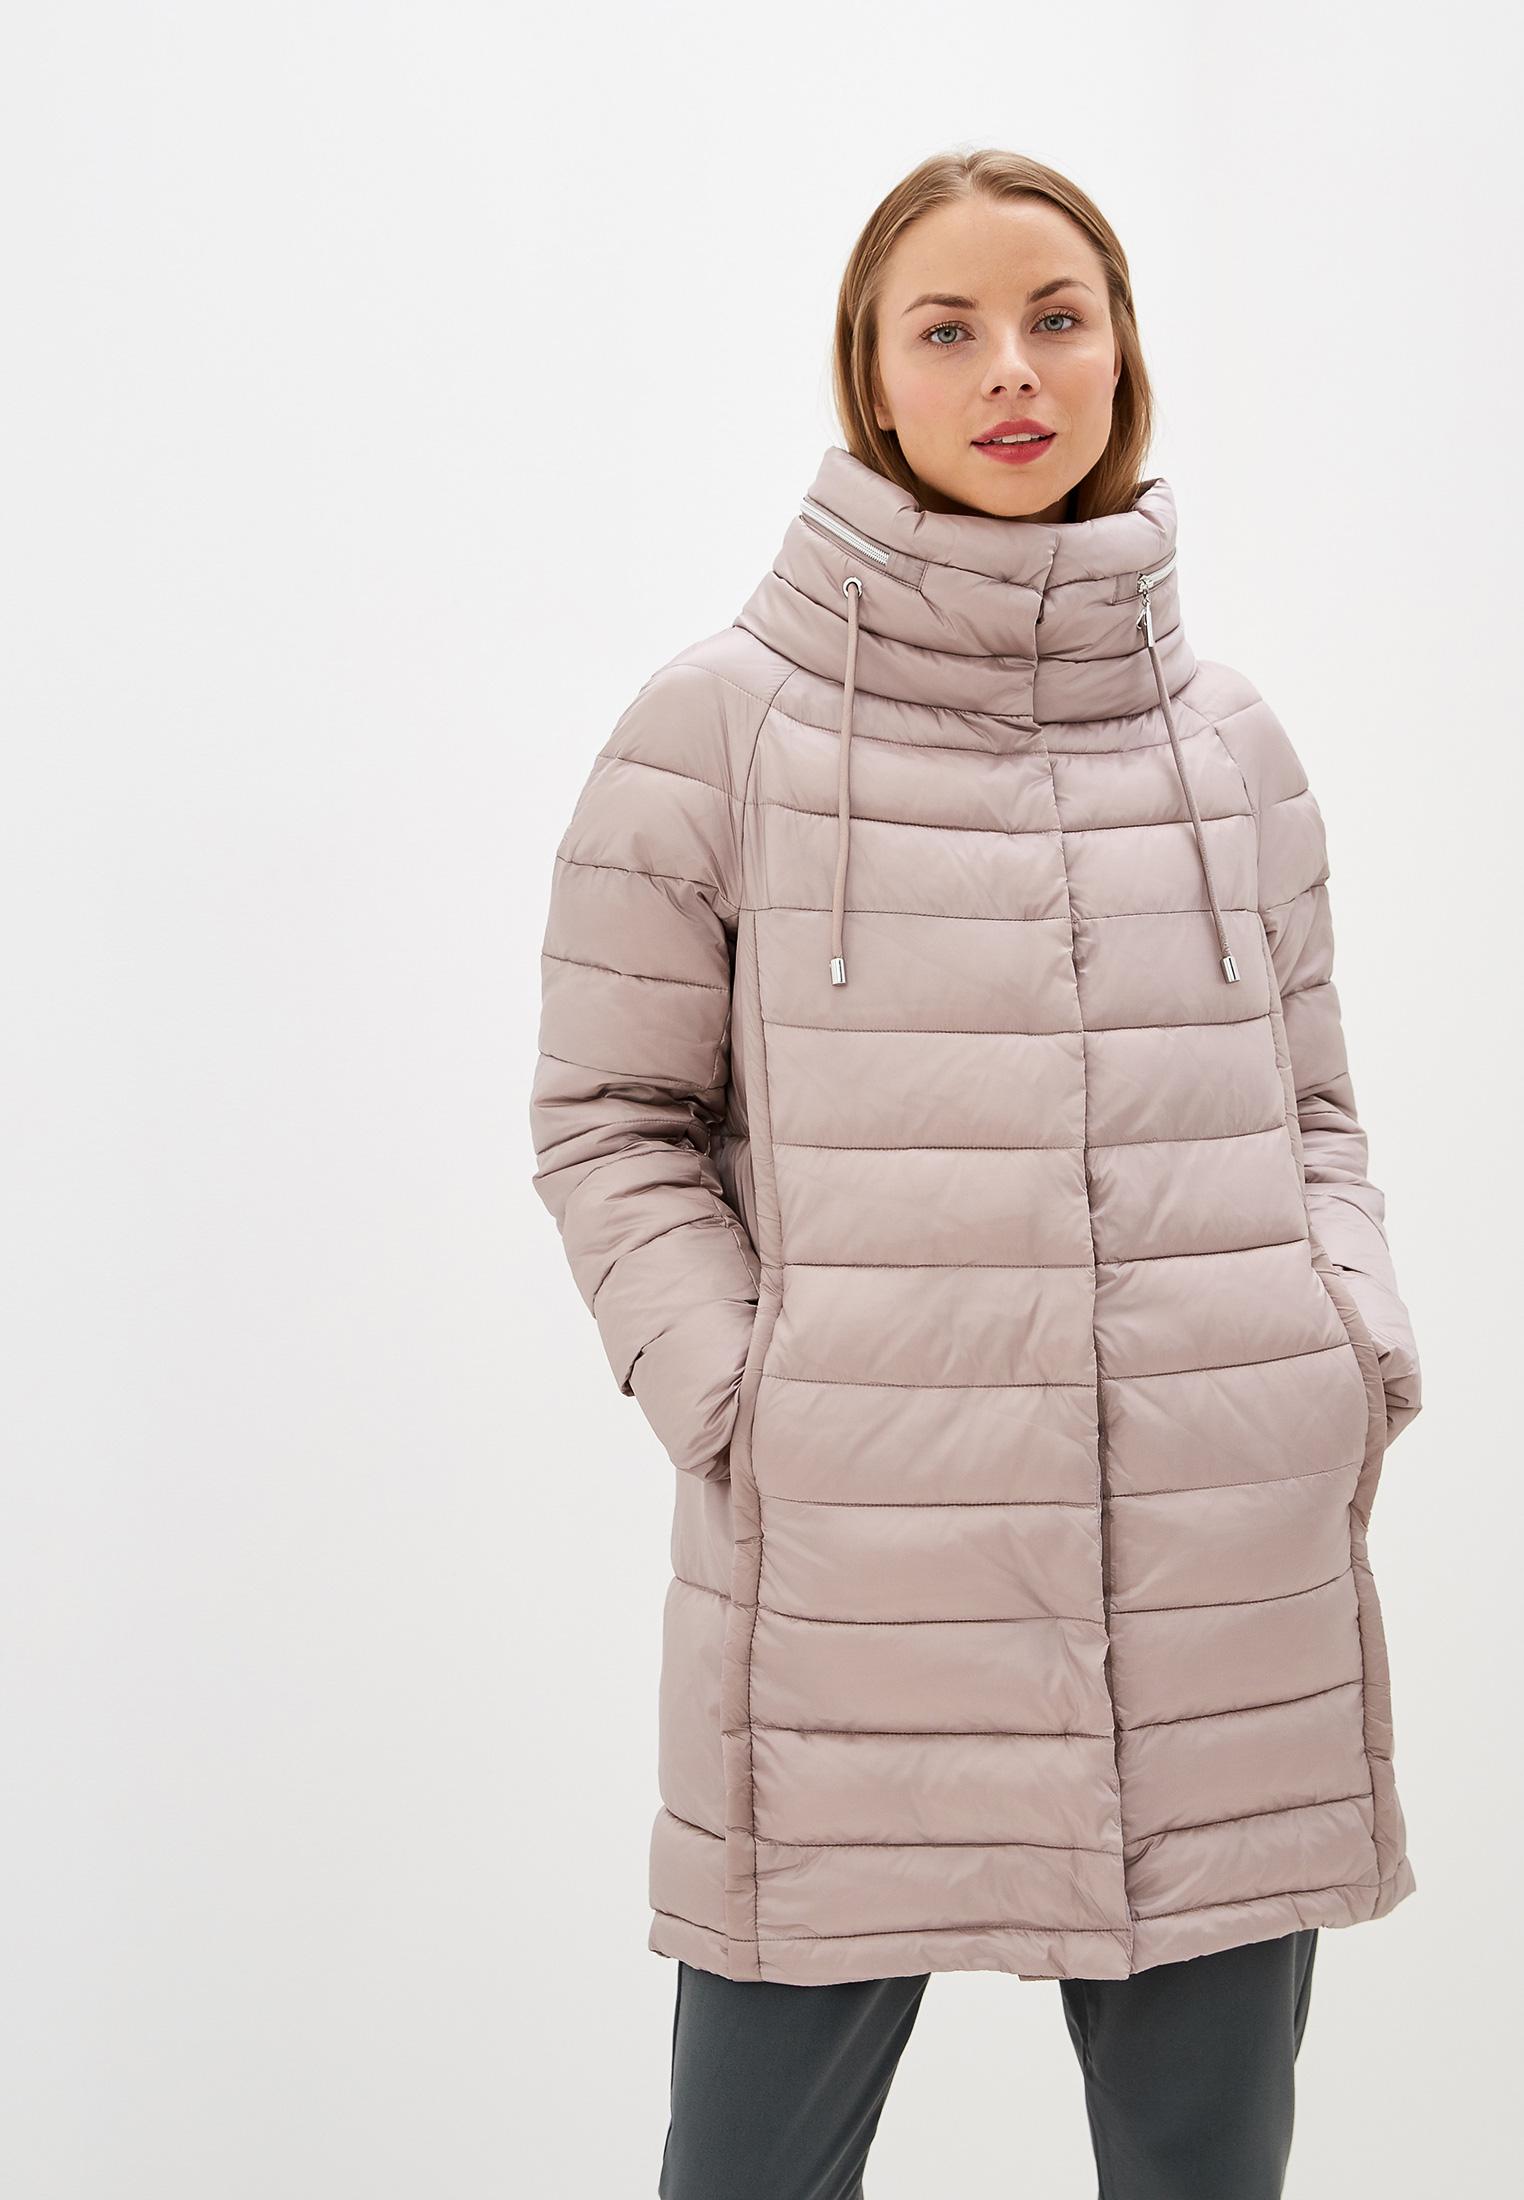 Куртка утепленная, Savage, цвет: серый. Артикул: SA004EWGESE3. Одежда / Верхняя одежда / Пуховики и зимние куртки